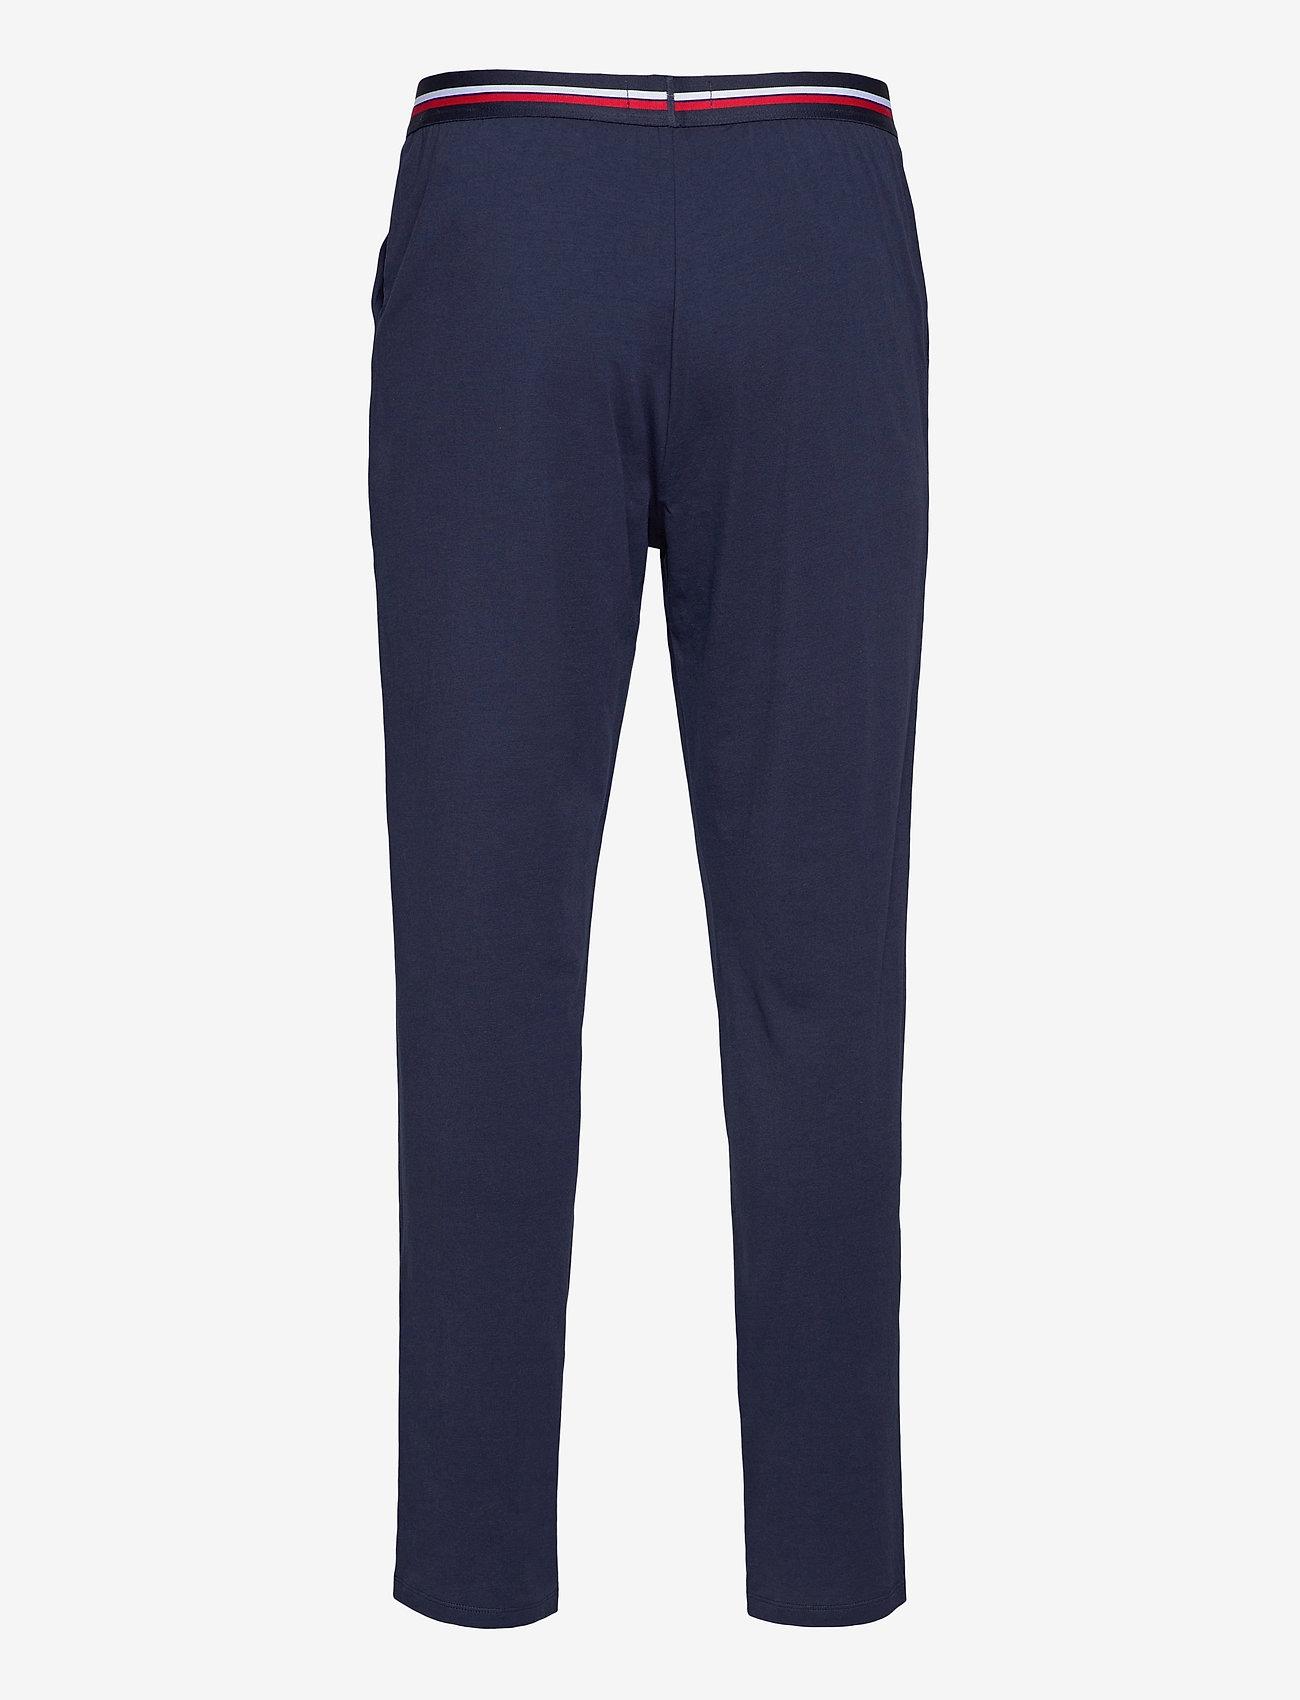 Lacoste - Pyjamas pants men - bottoms - navy blue - 1